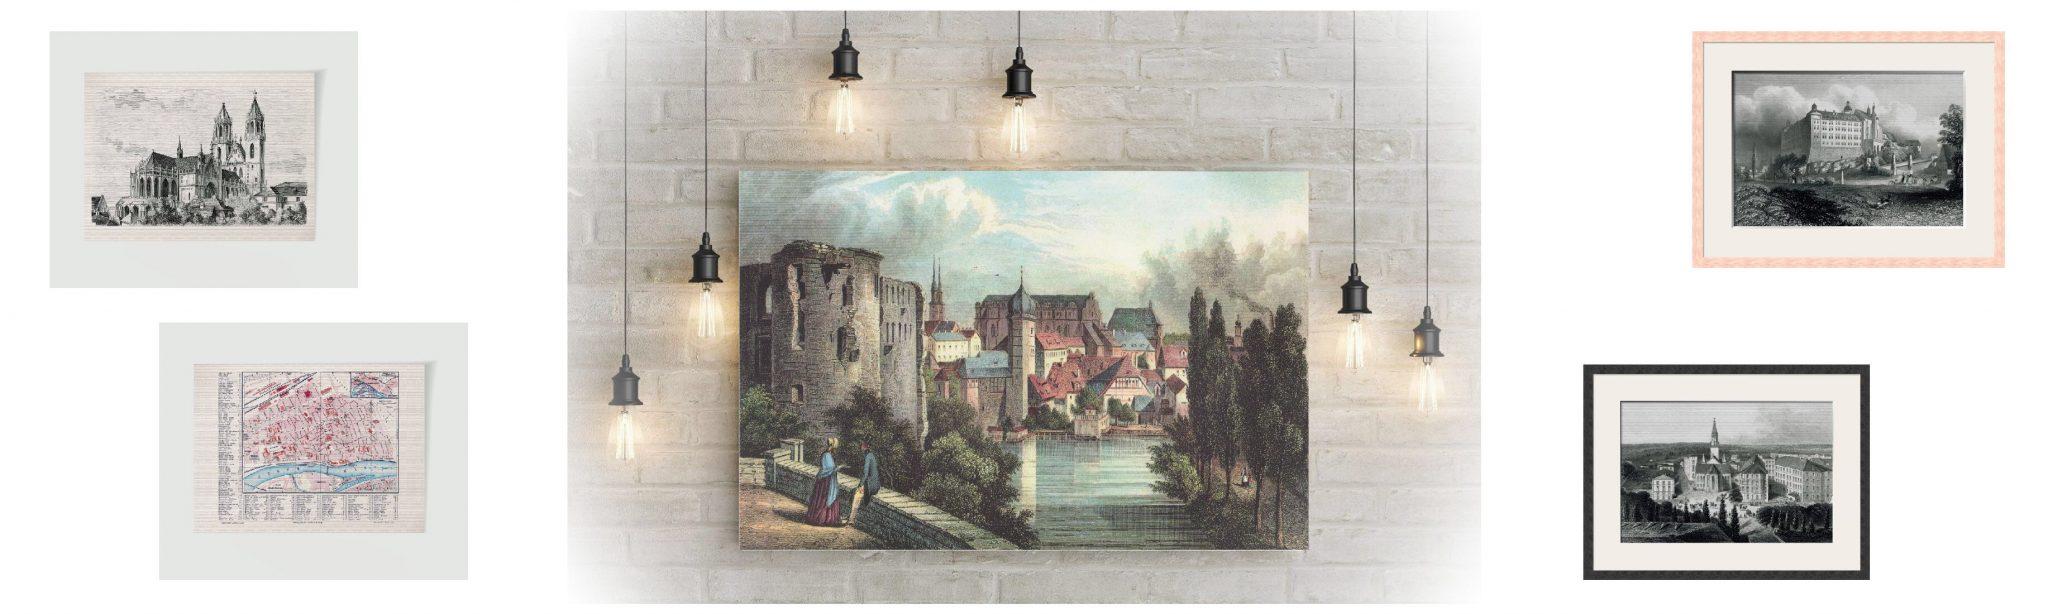 https://www.historienbilder.de/wp-content/uploads/2018/03/IMG_1911.jpg